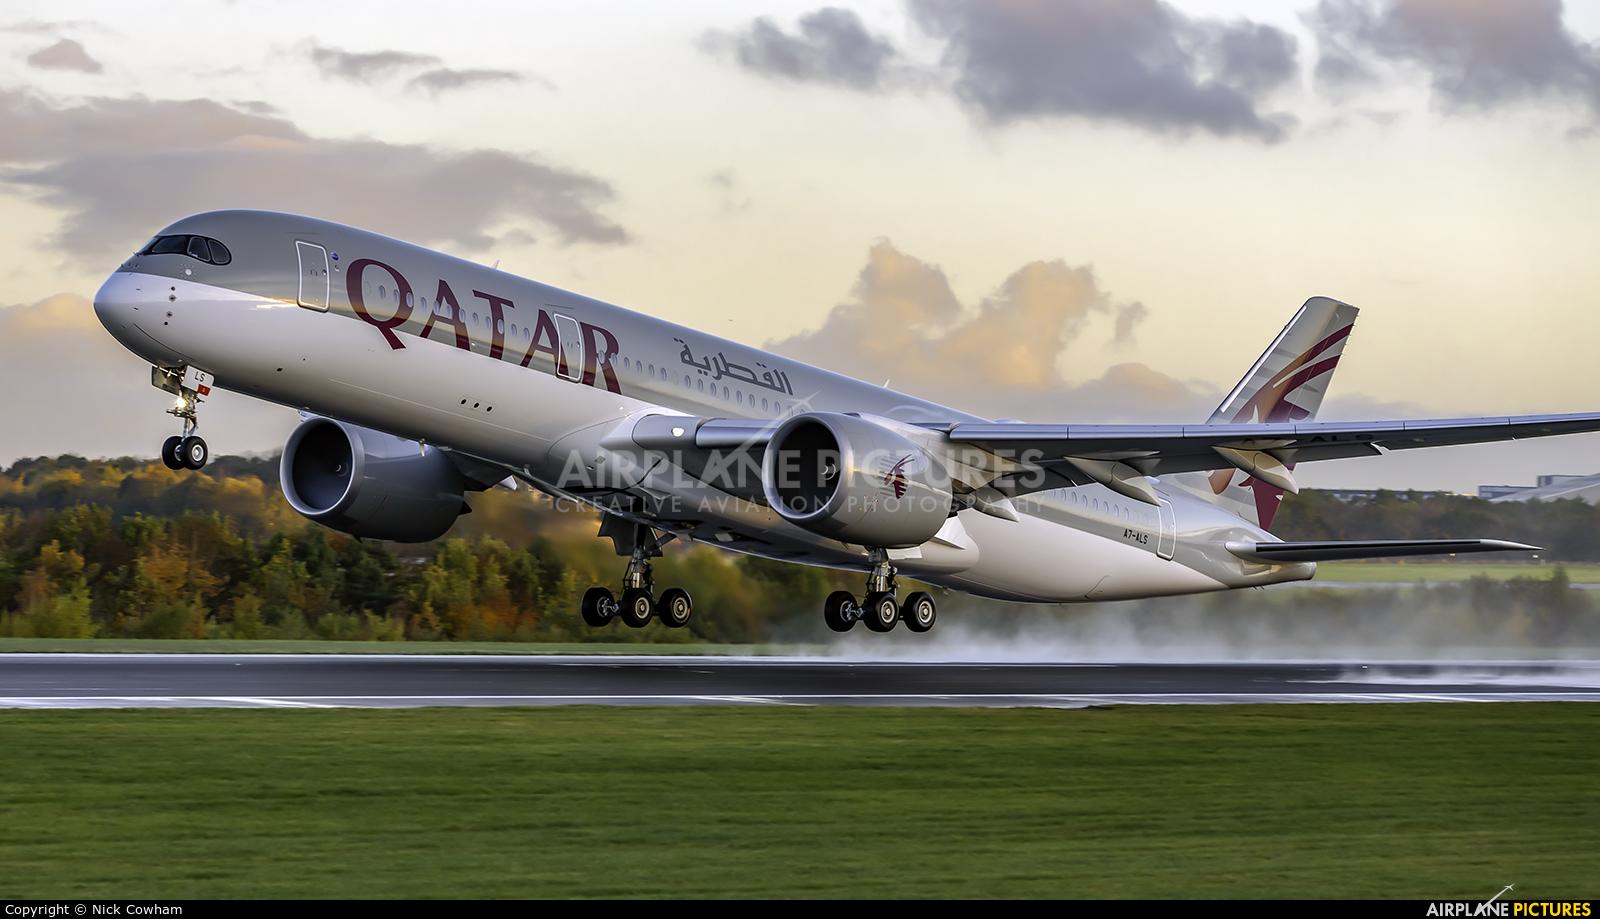 Qatar Airways A7-ALS aircraft at Manchester